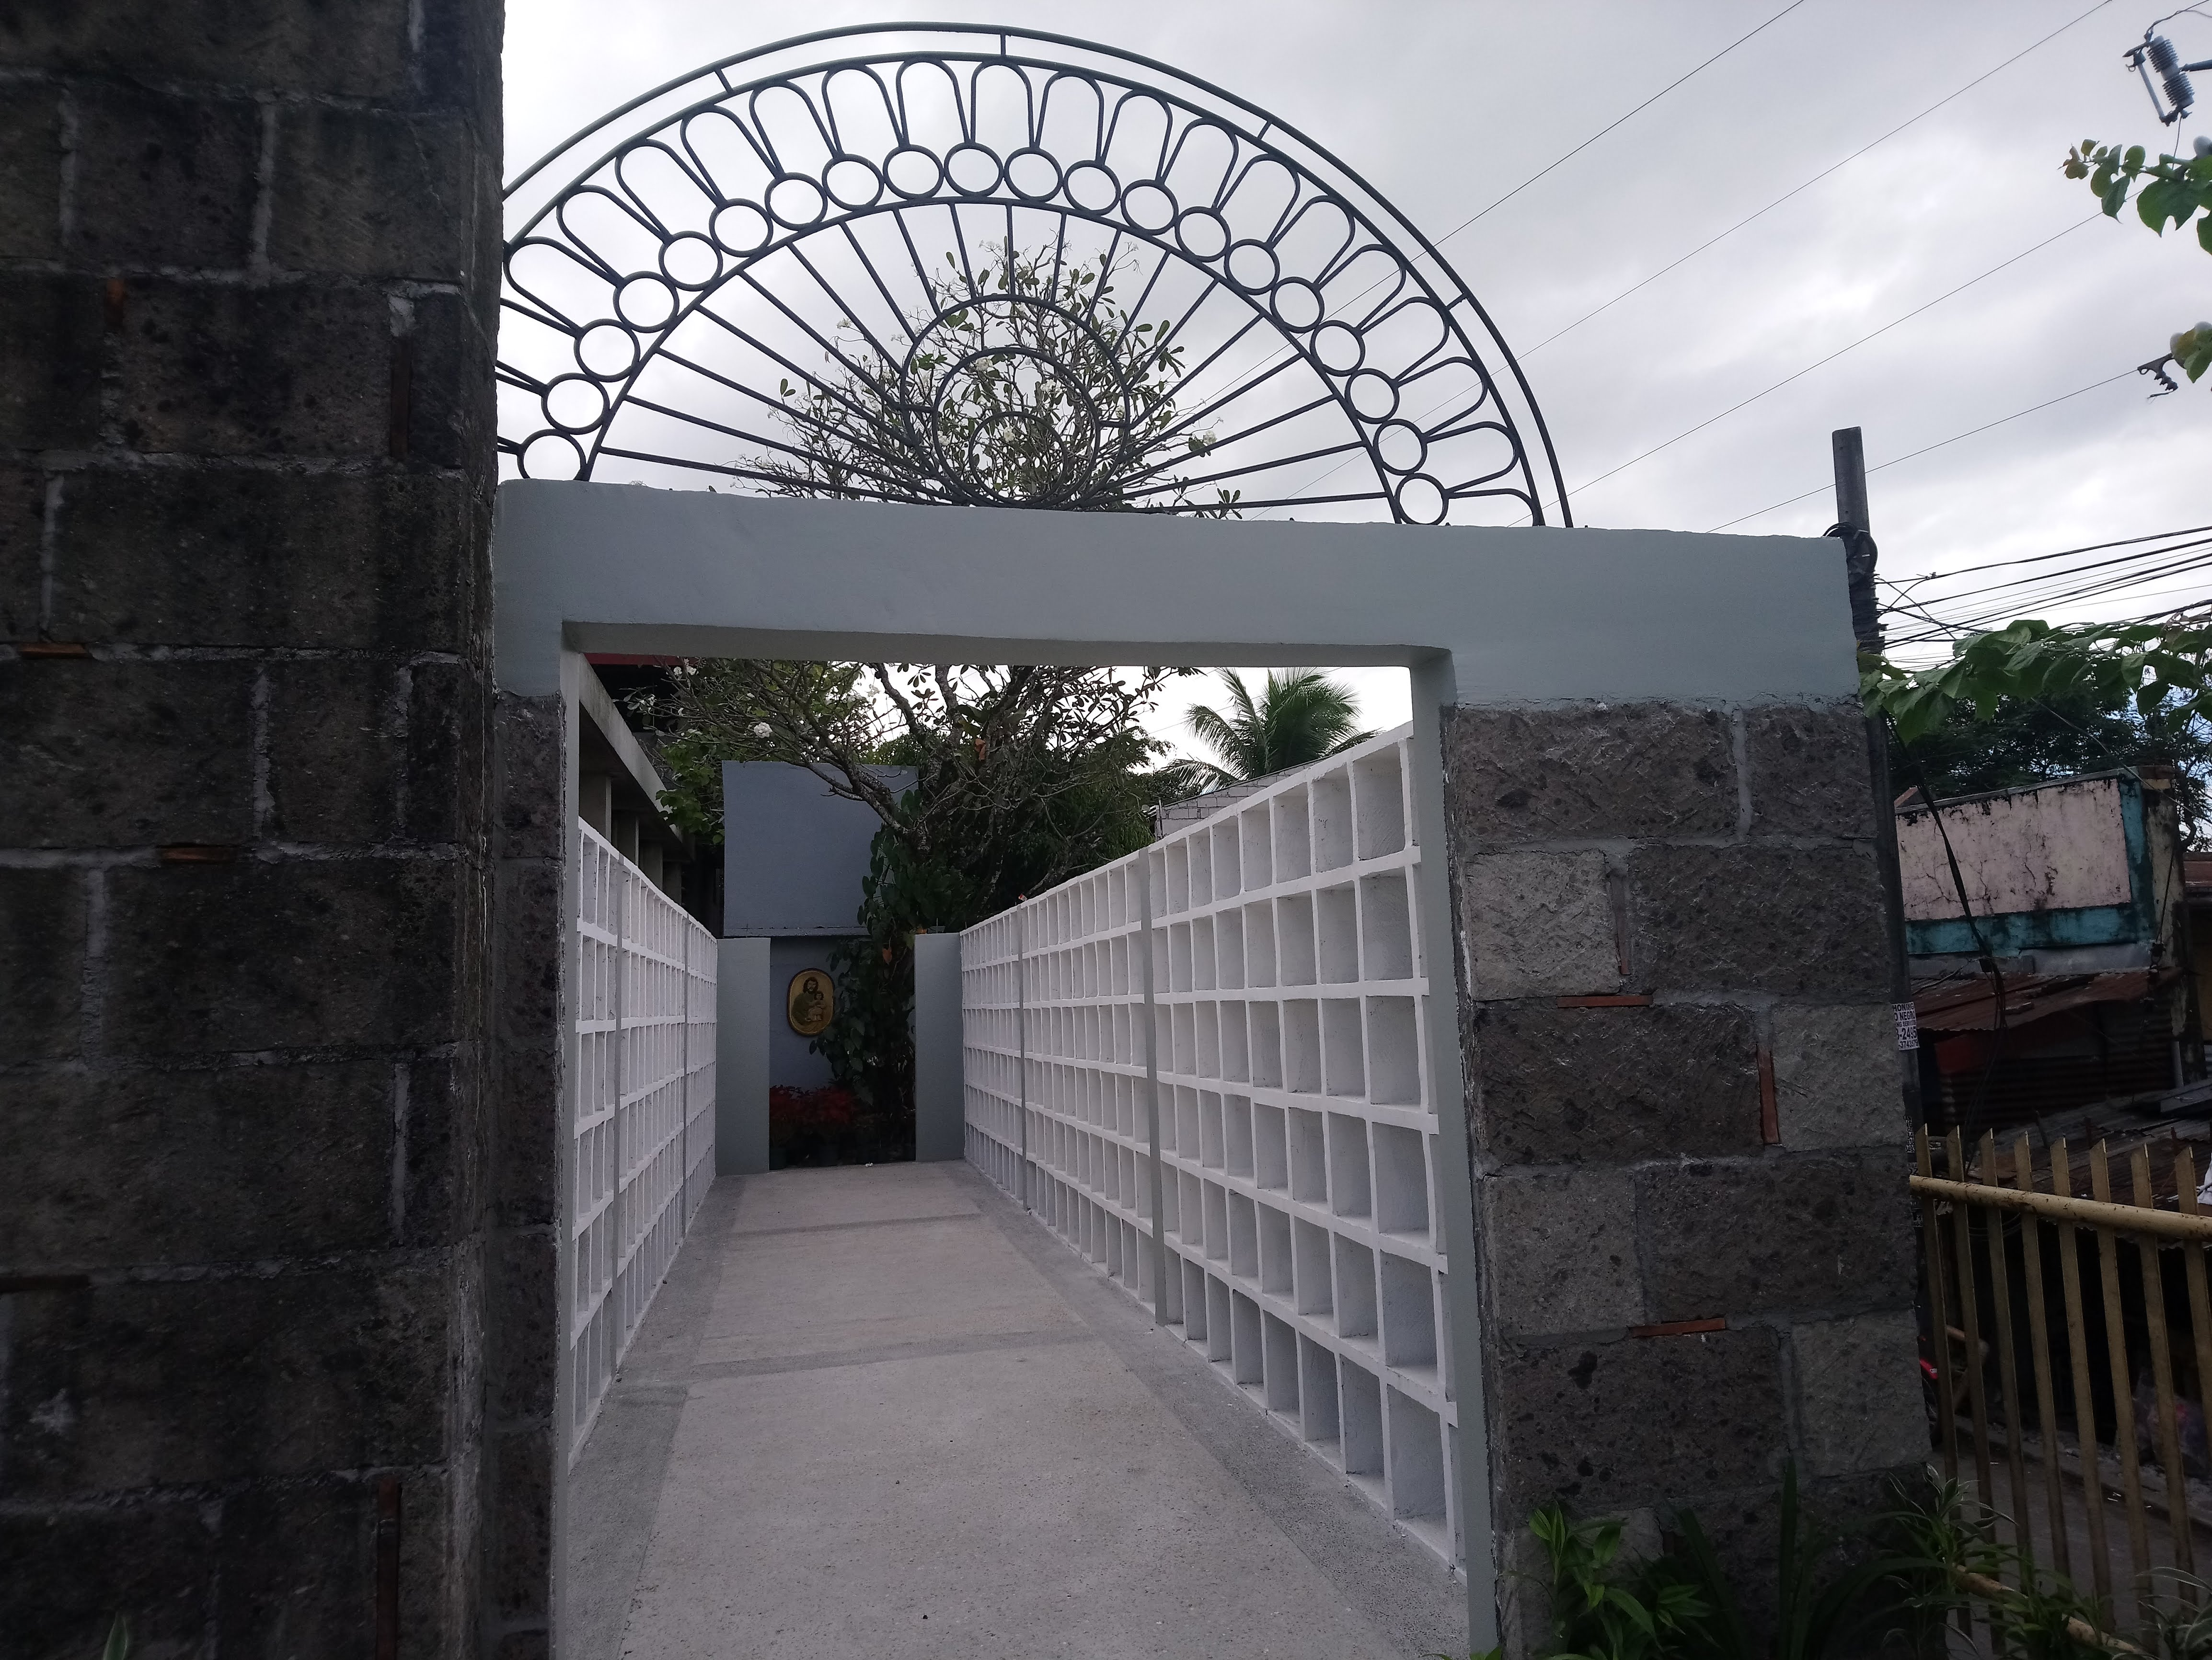 saint-joesph-the-worker-cemetery-vaults